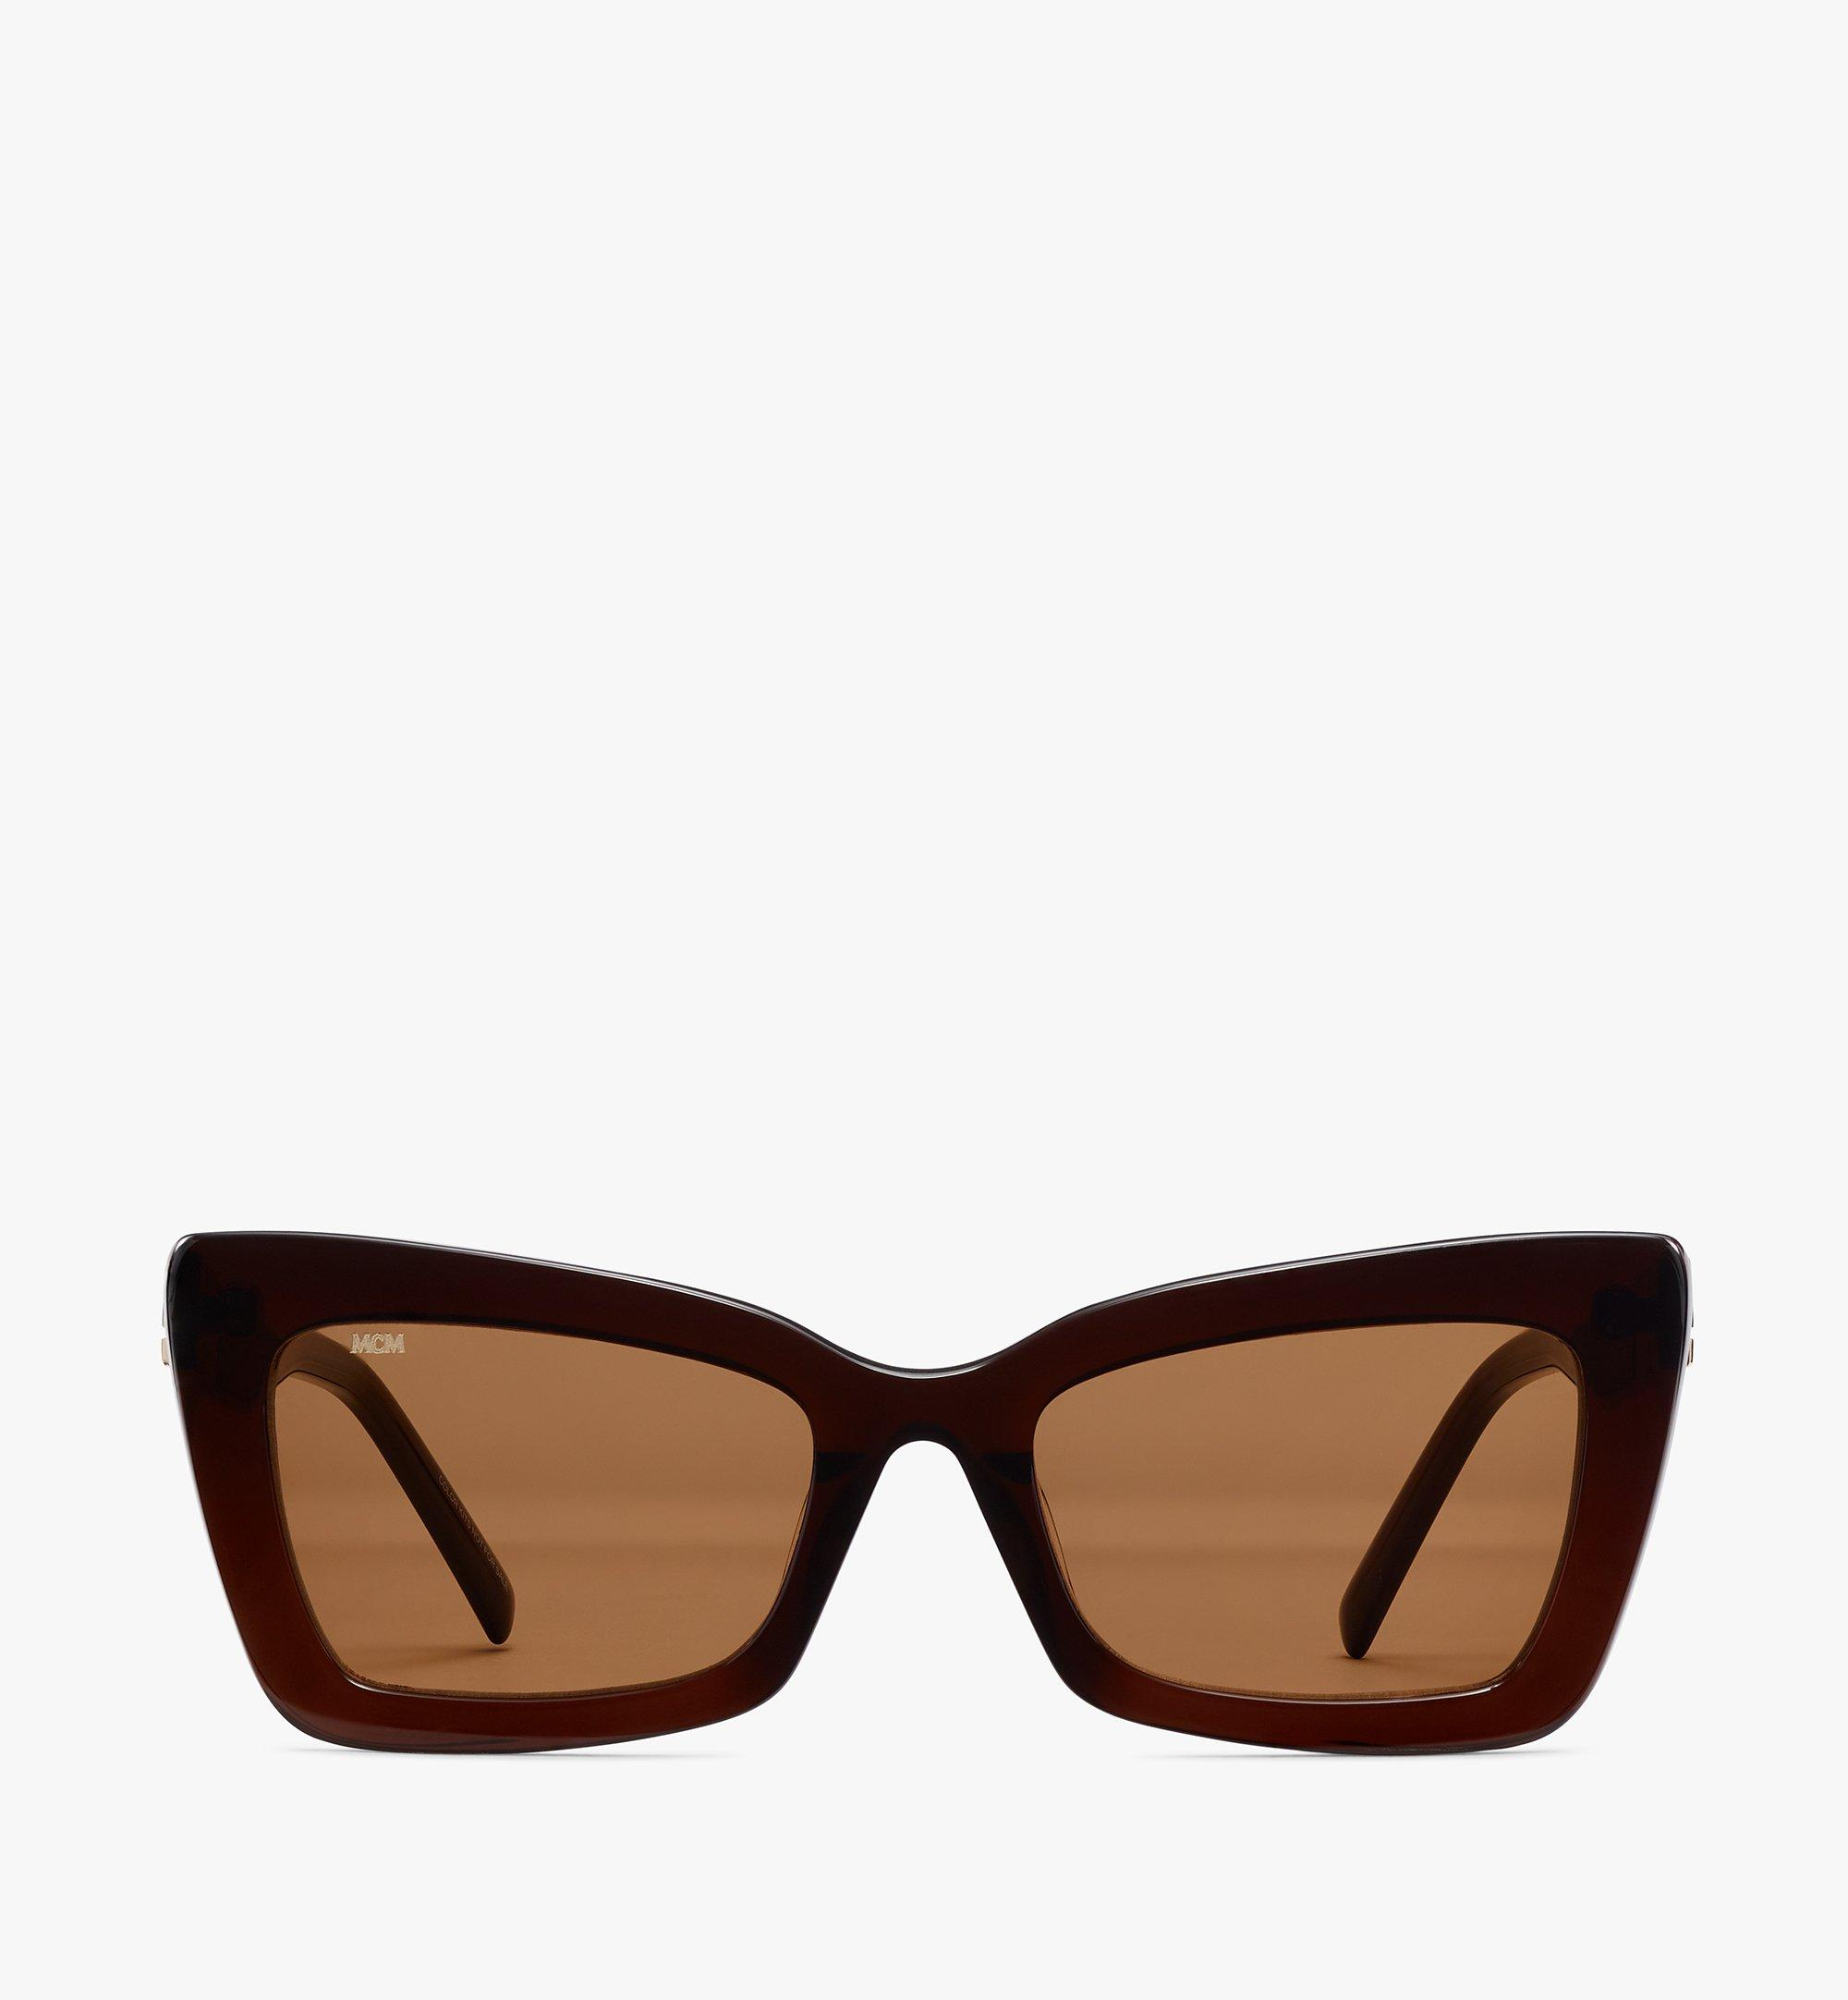 MCM 703S Rectangular Sunglasses Brown MEGBSMM20NR001 Alternate View 1